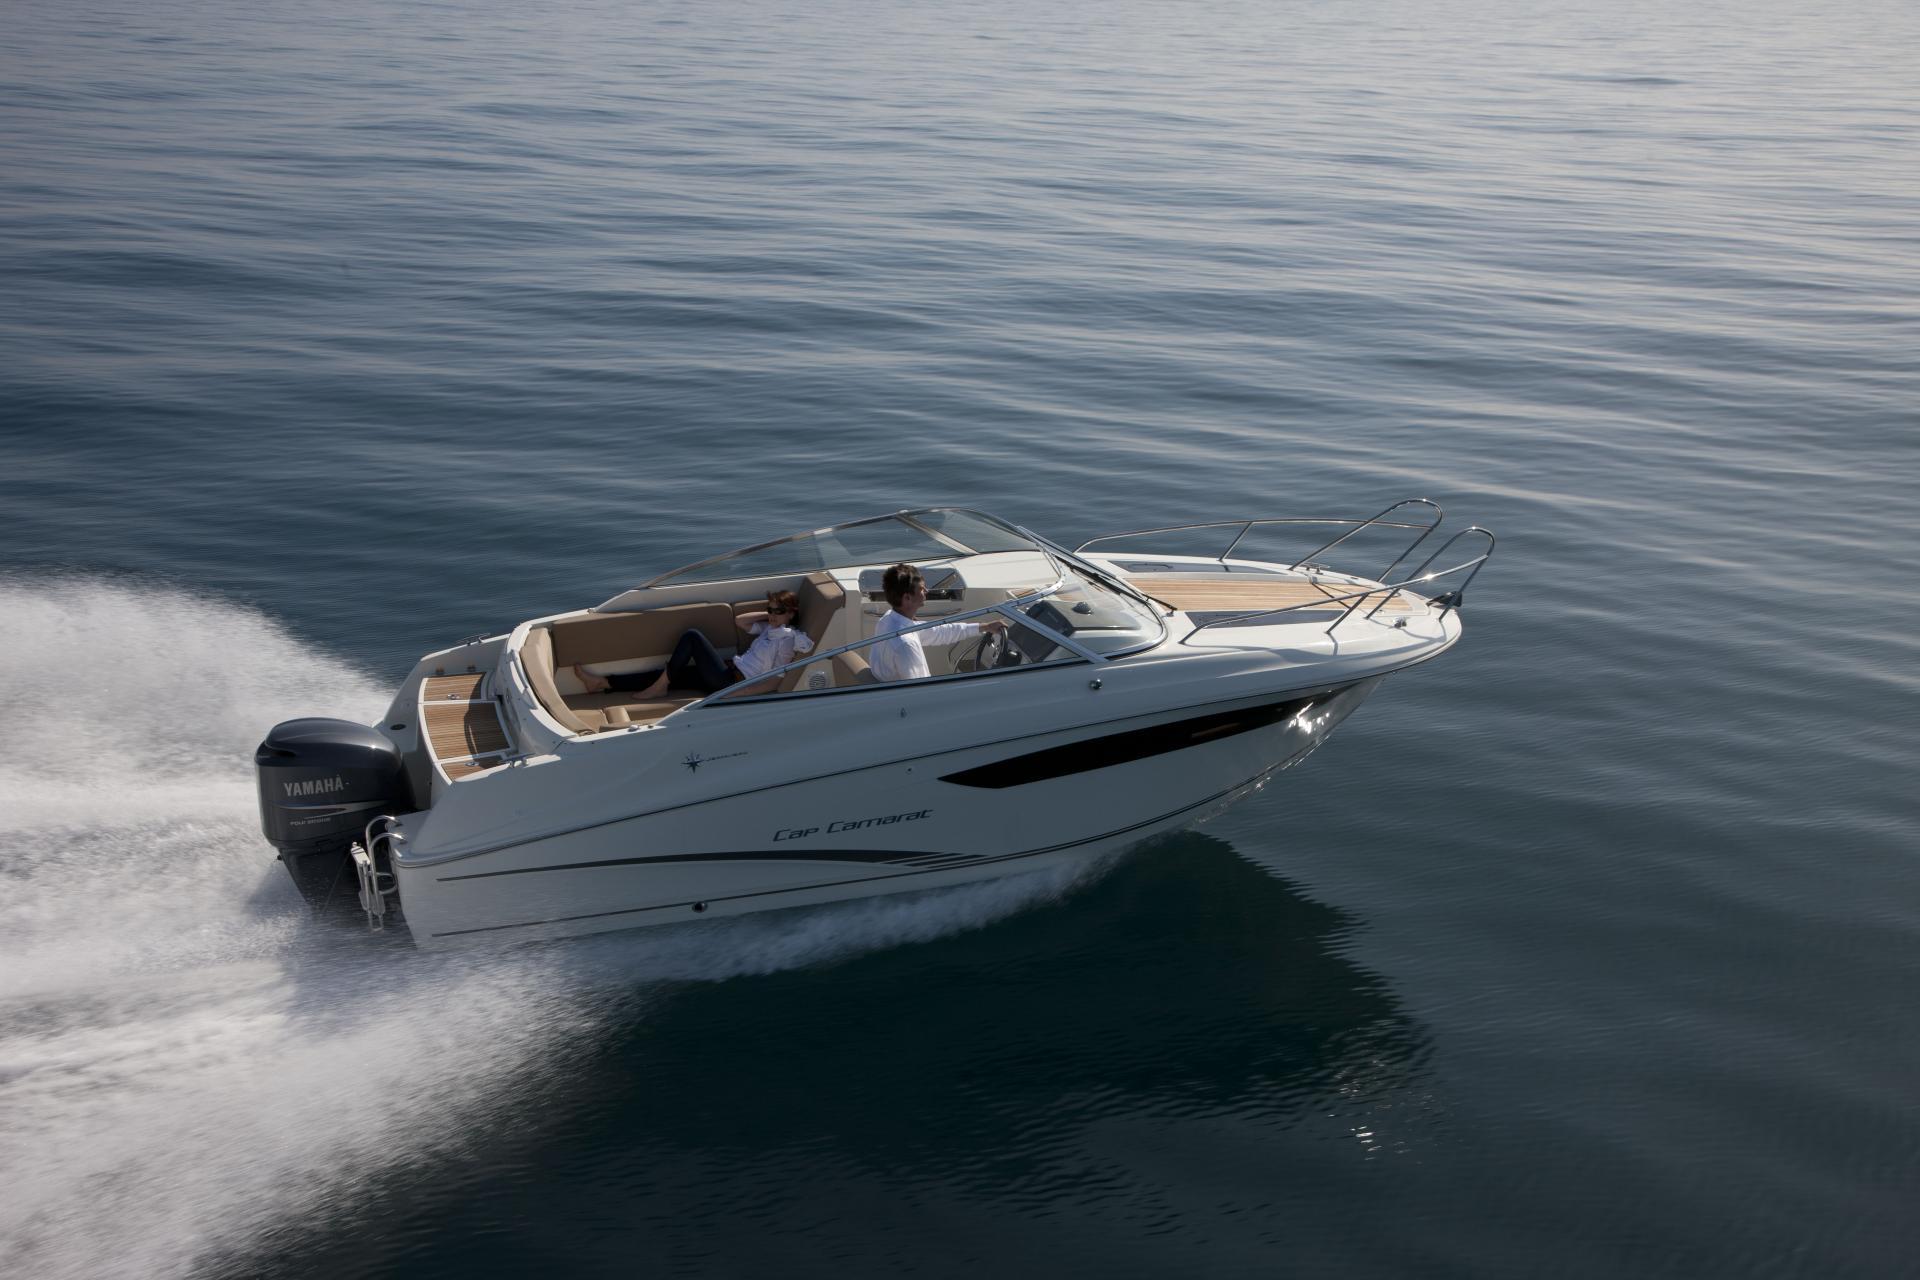 listing used havasu com boattrader cabins city campbell az cruiser cuddy cabin cruisers lake